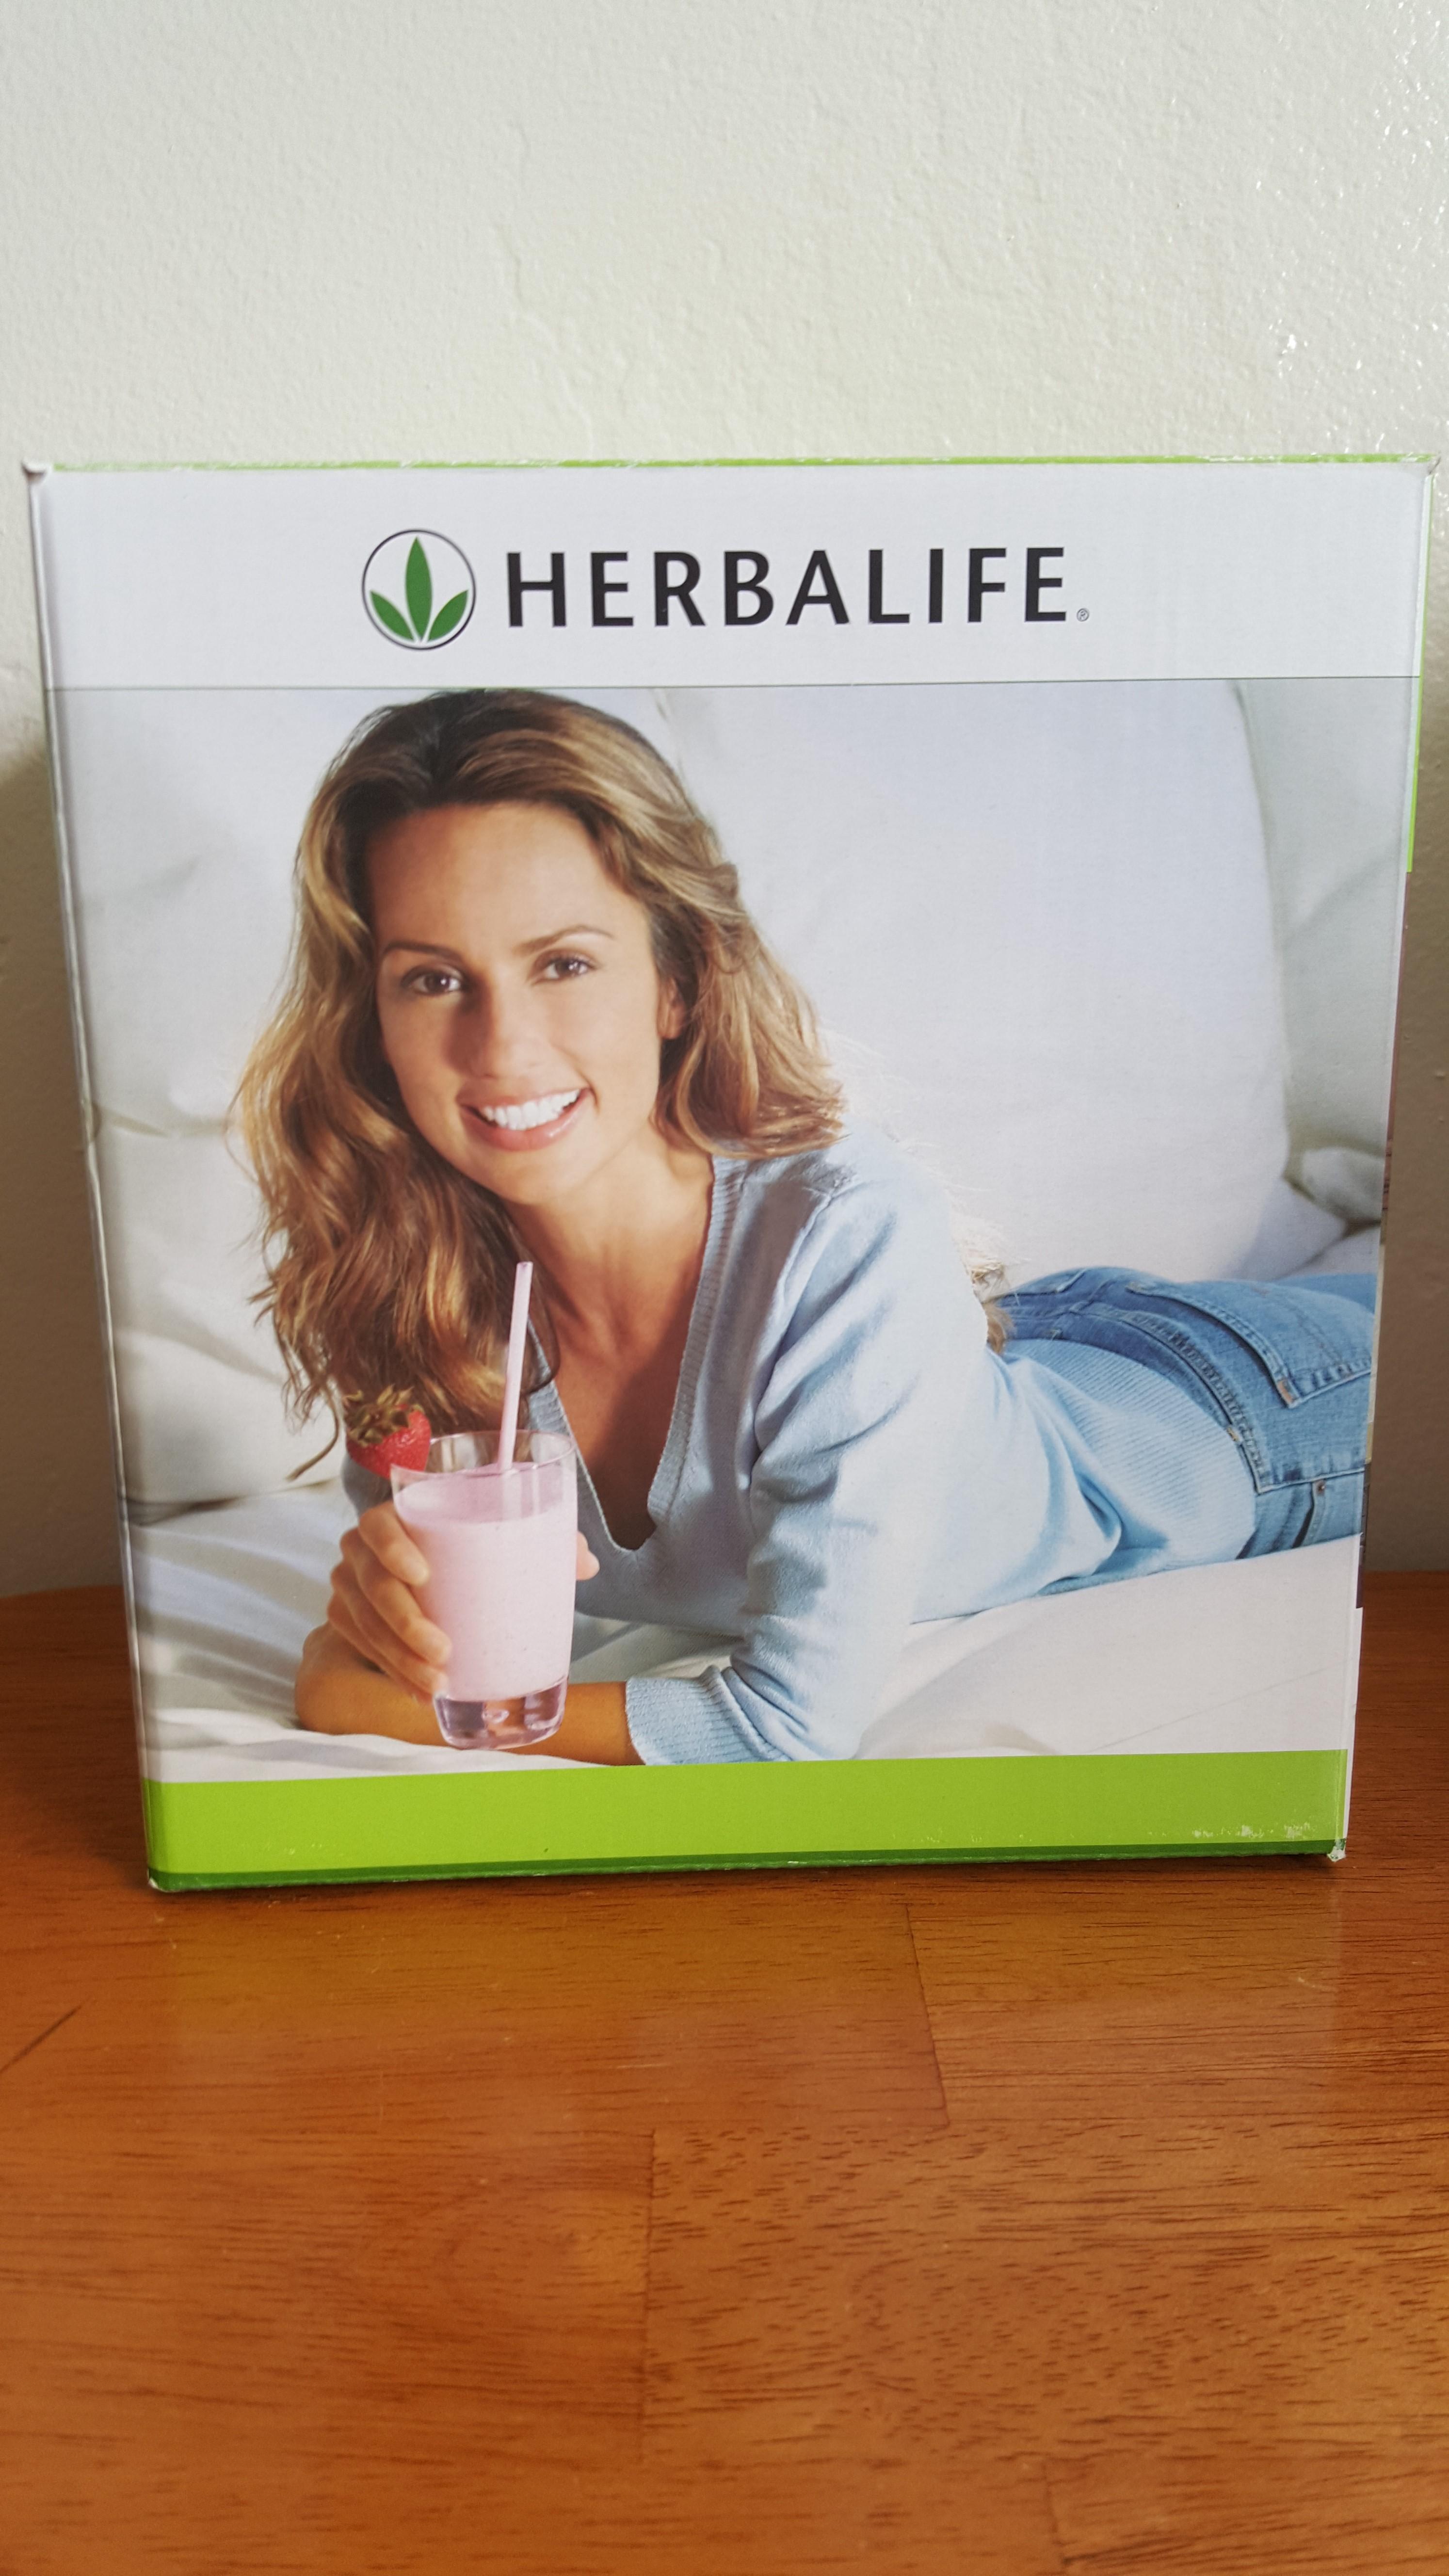 Herbalife Distributor 2501 Ripon Ct, Bakersfield, CA 93309